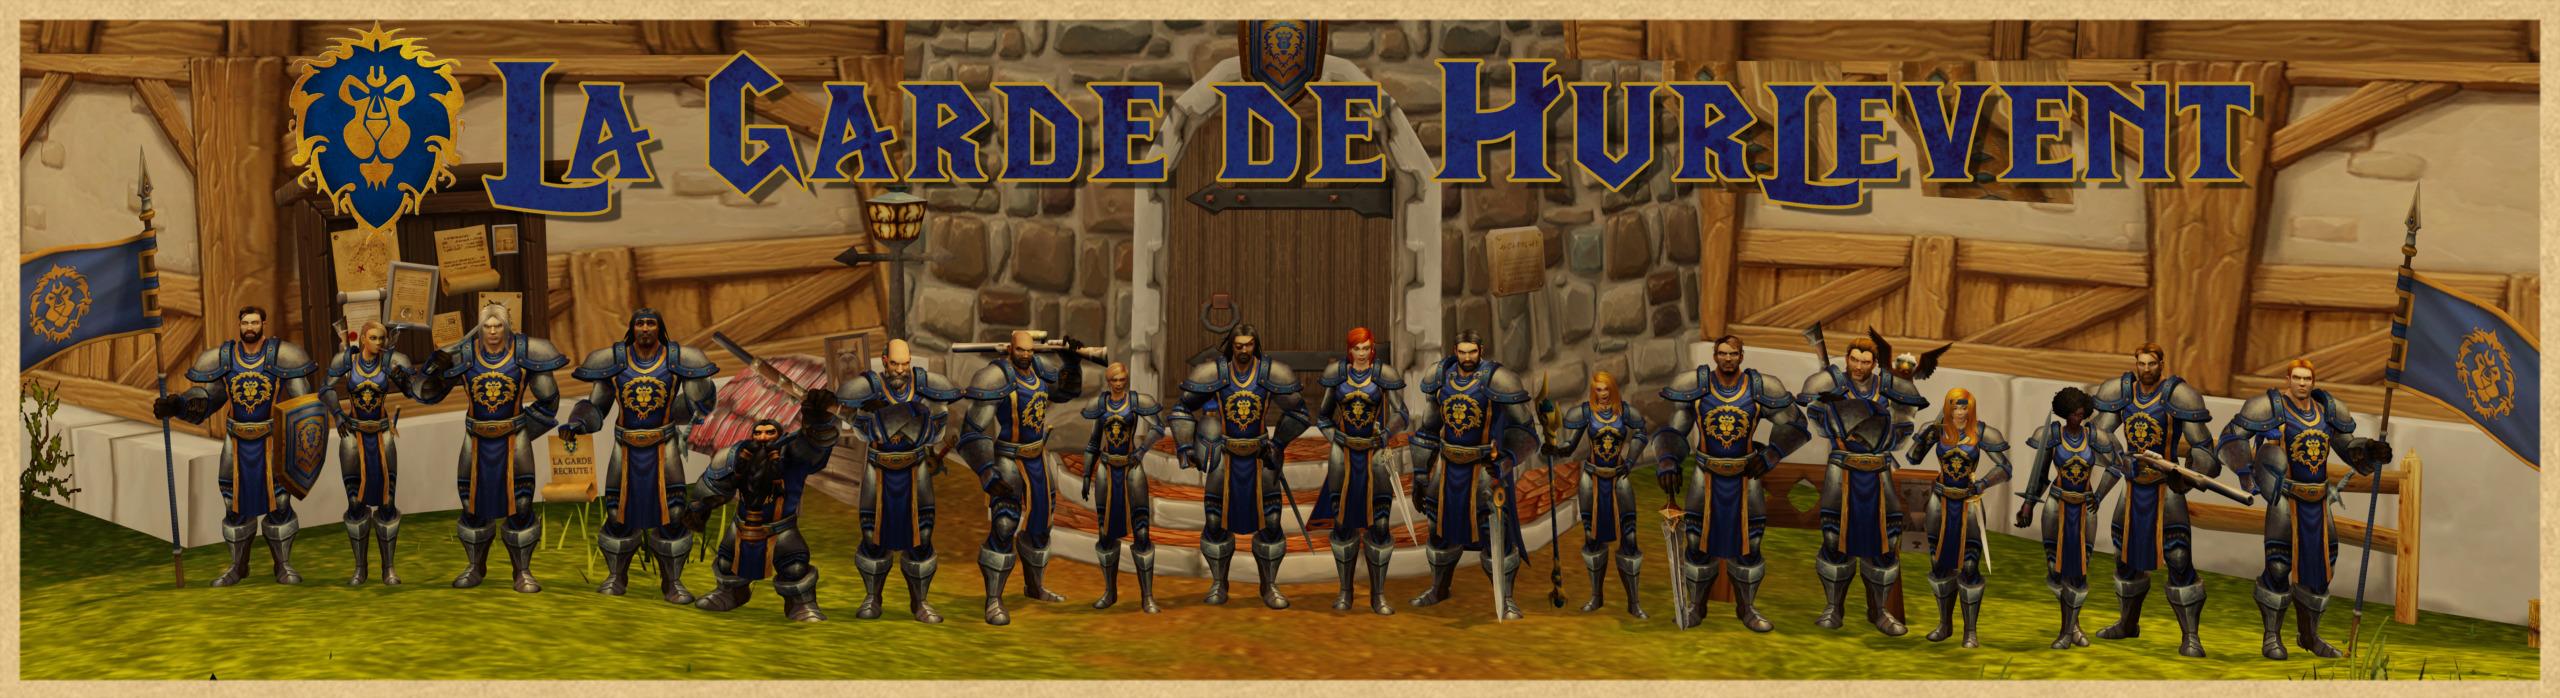 La Garde de Hurlevent